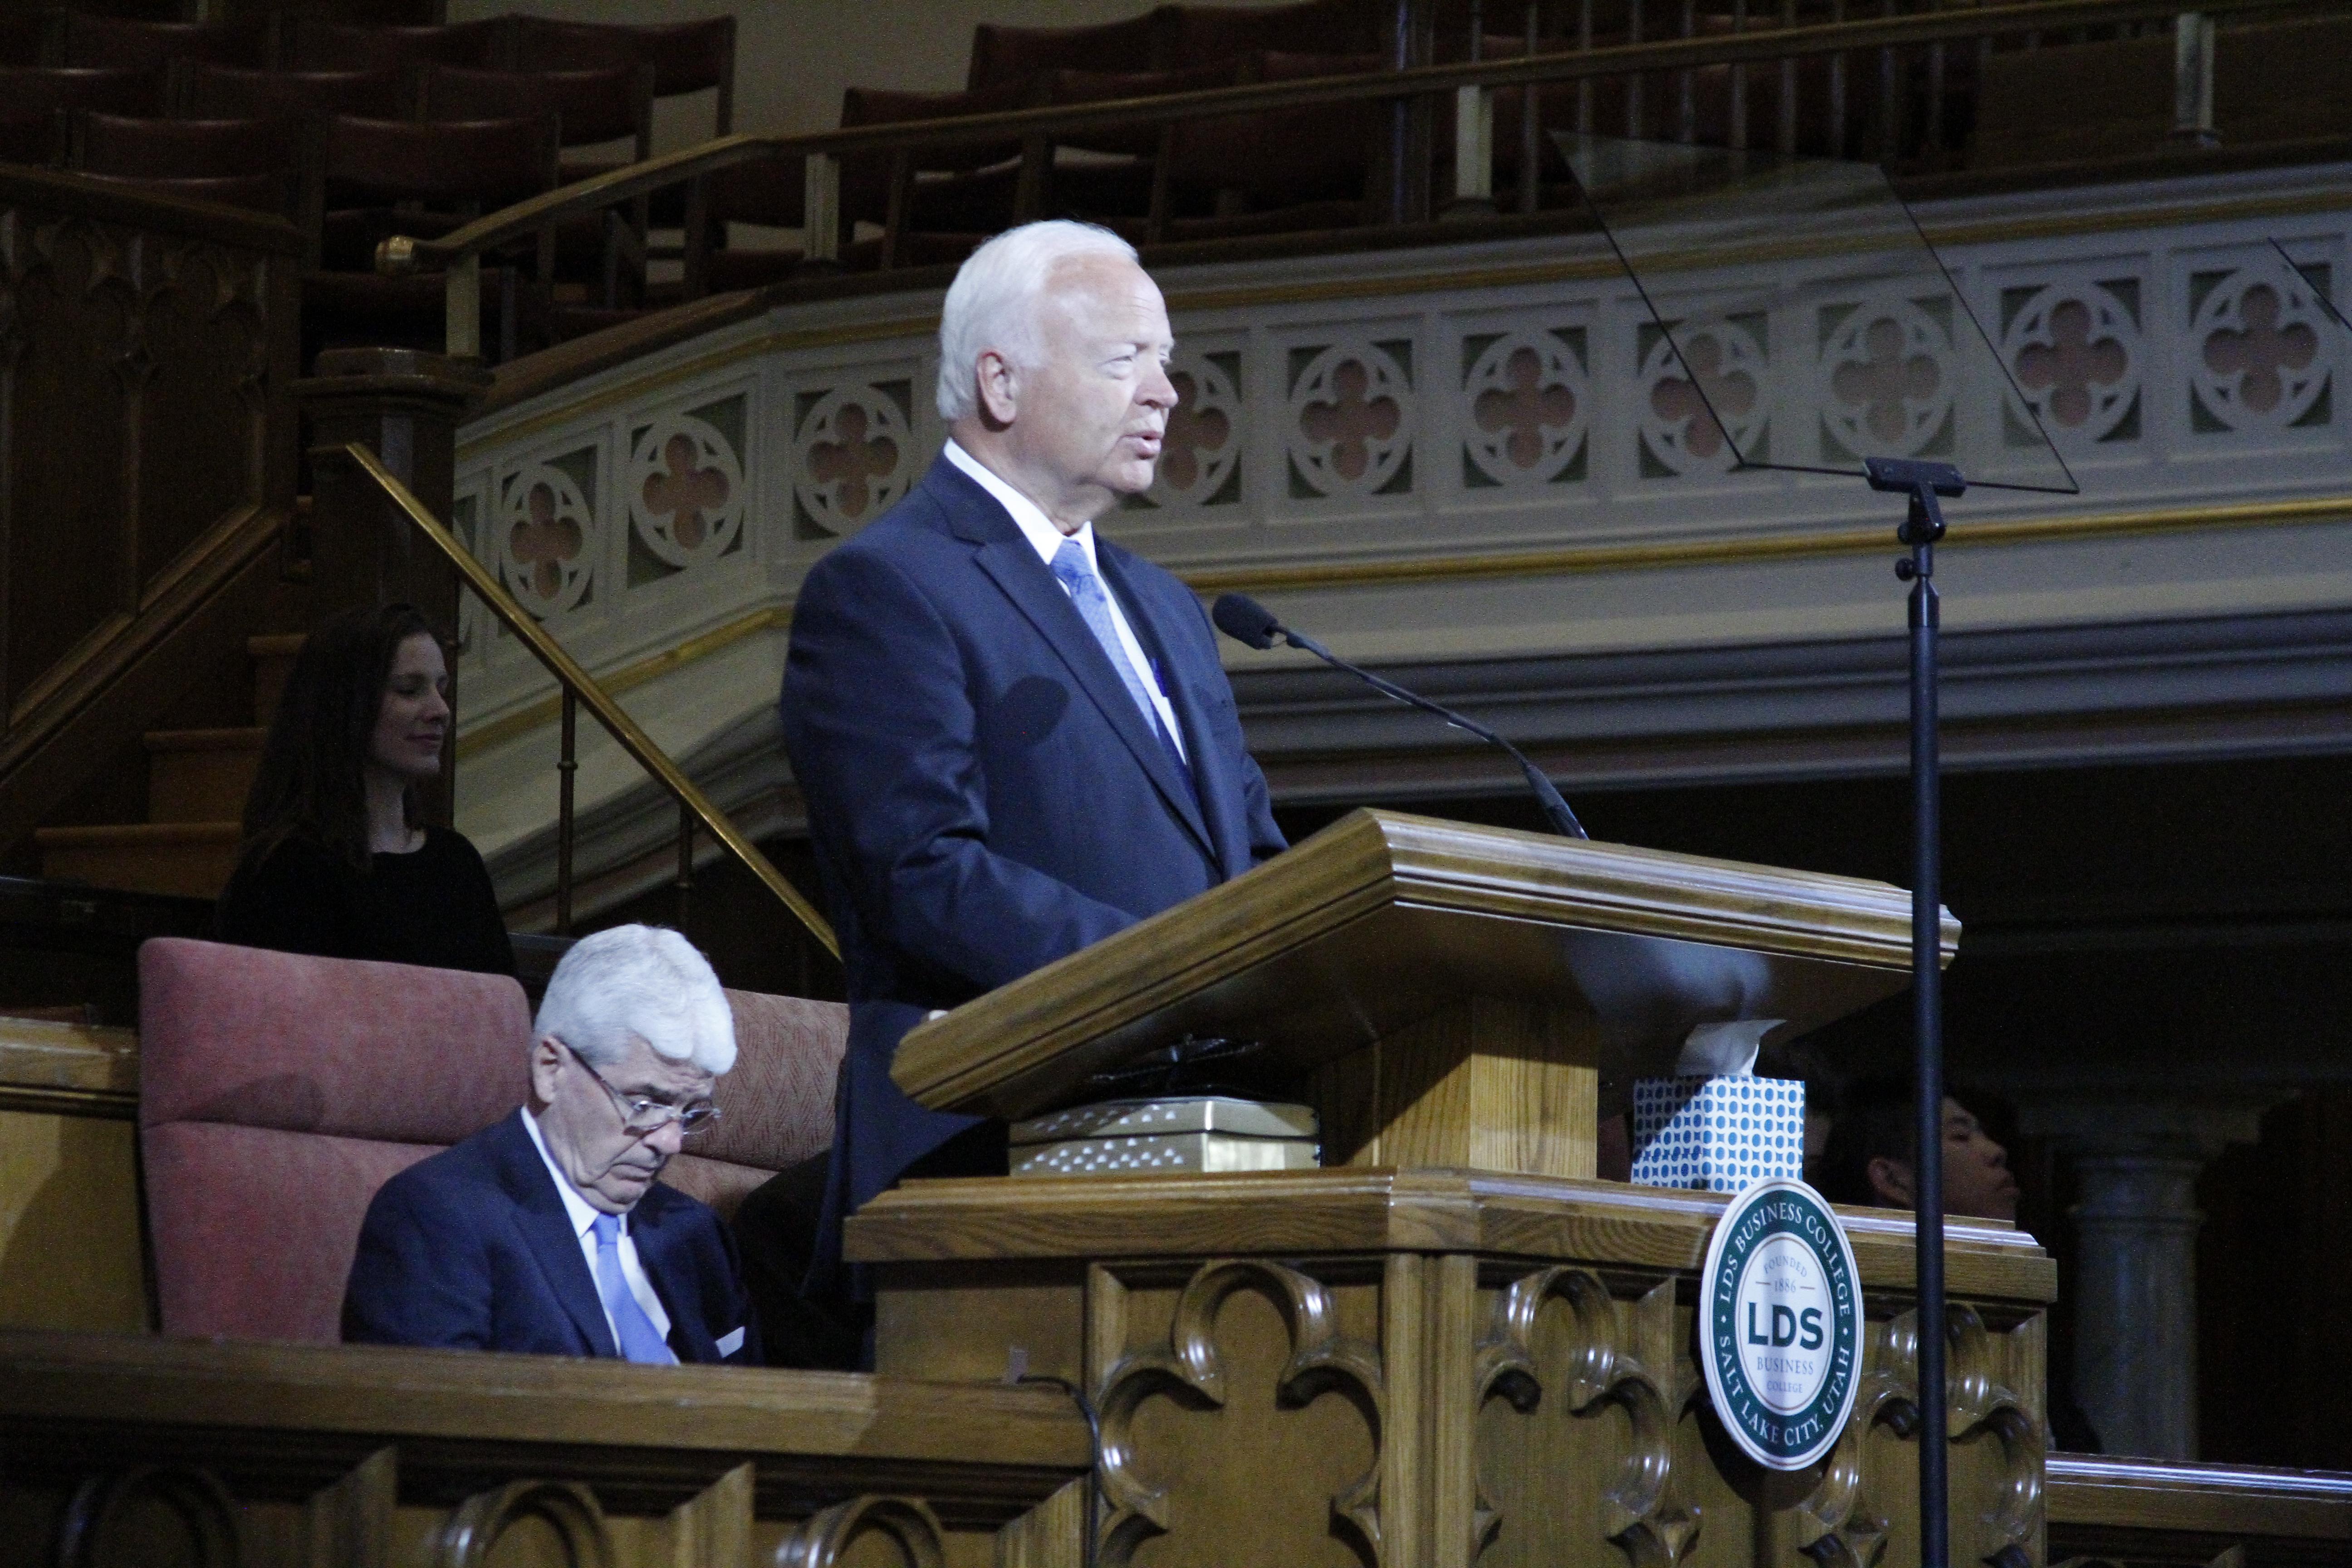 Elder Kent F. Richards, emeritus General Authority Seventy, speaks to LDSBC students in a devotional address on Tuesday, June 11, 2019.